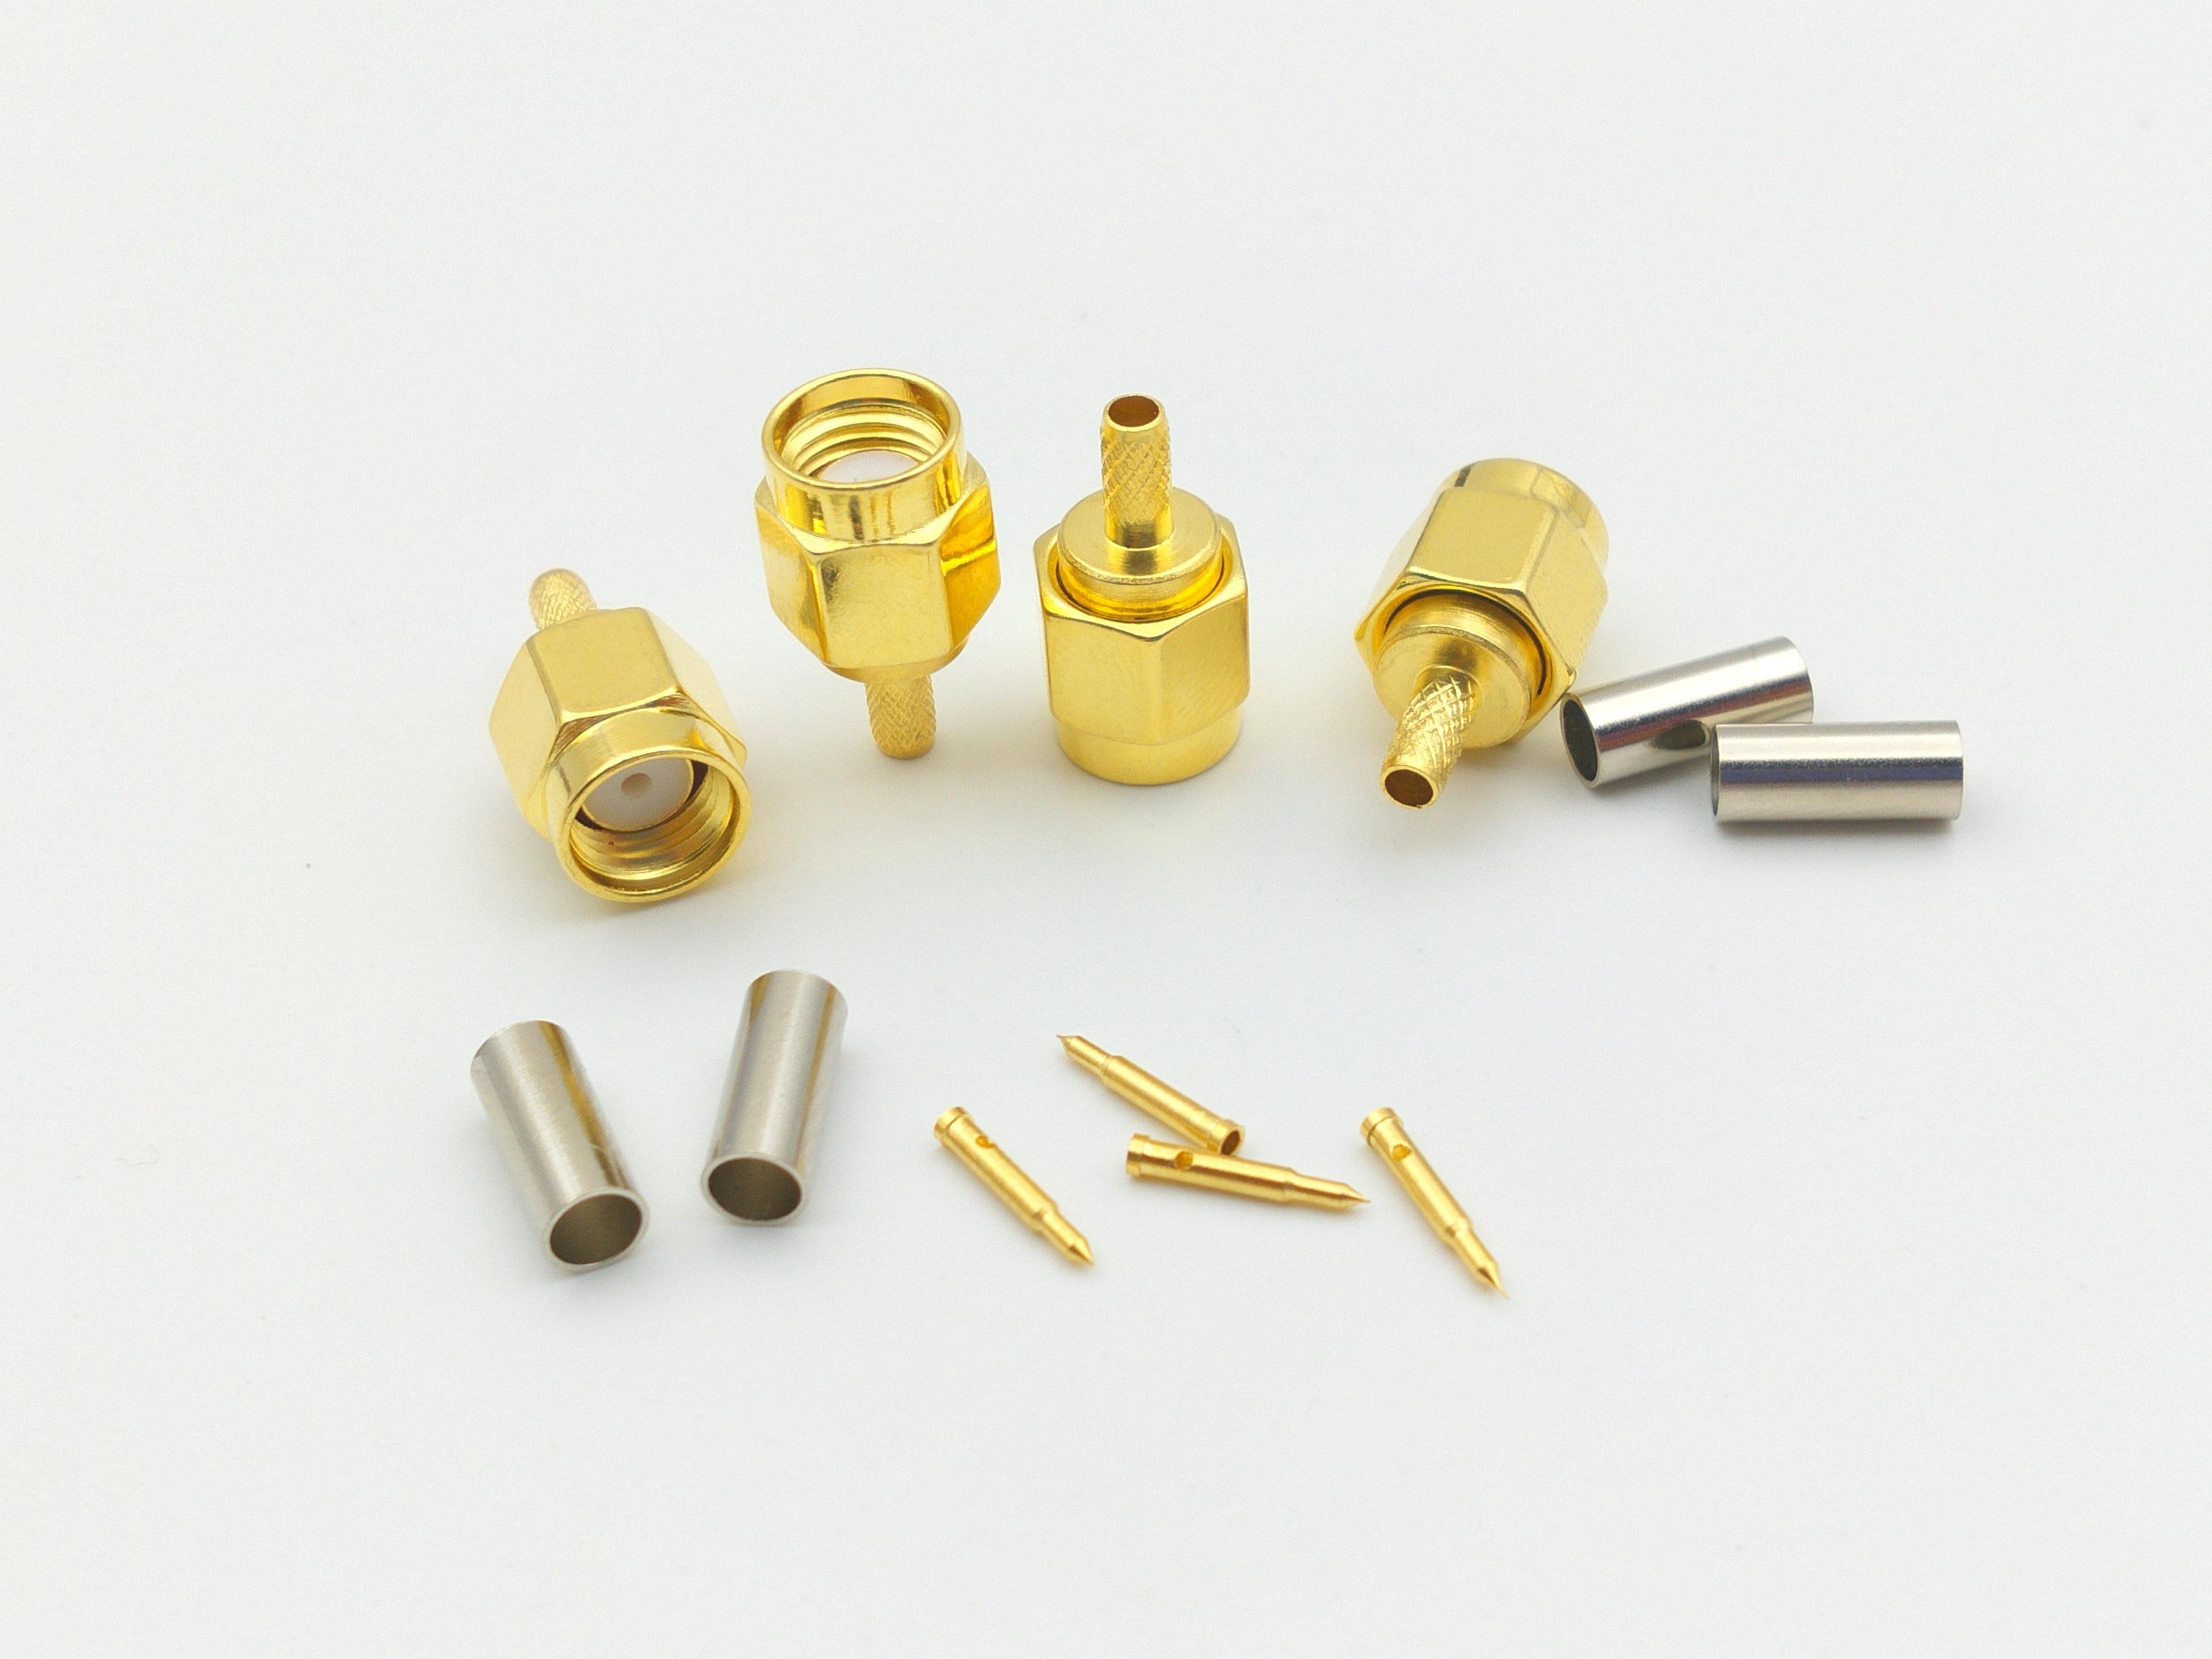 200 pcs gold plated SMA male plug crimp RG174 RG316 LMR100 cable RF connectors